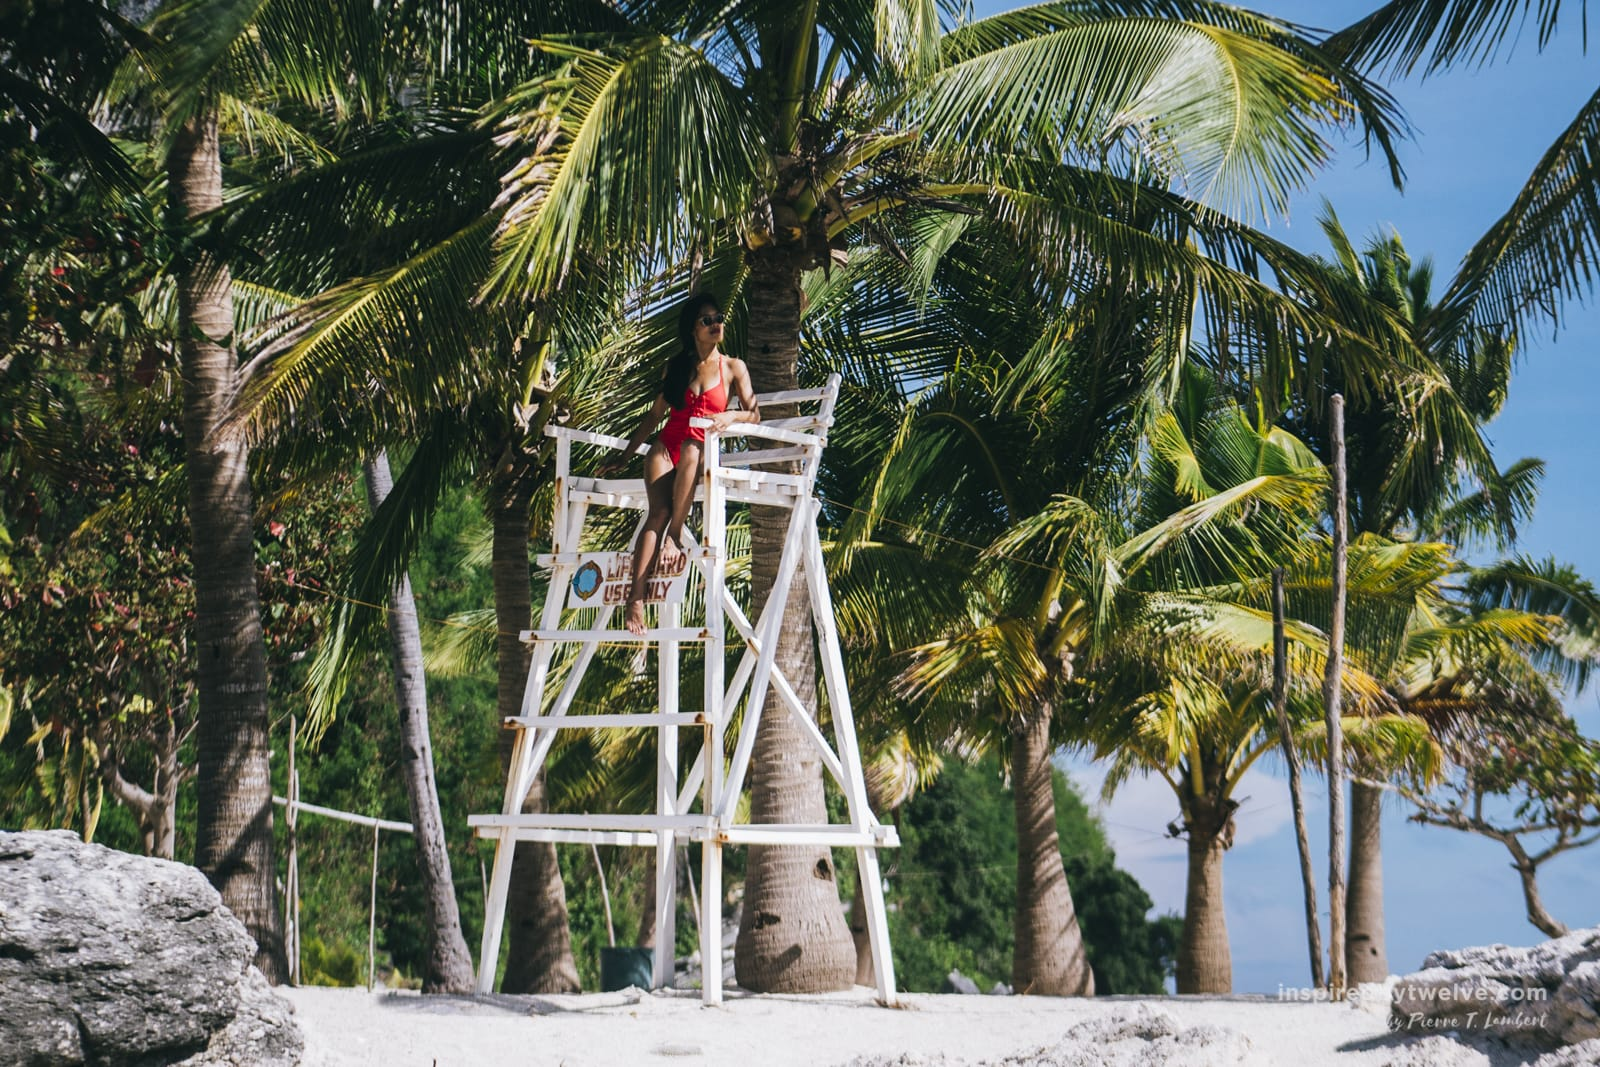 Islas de Gigantes – 10 Photos to Inspire Your Travels